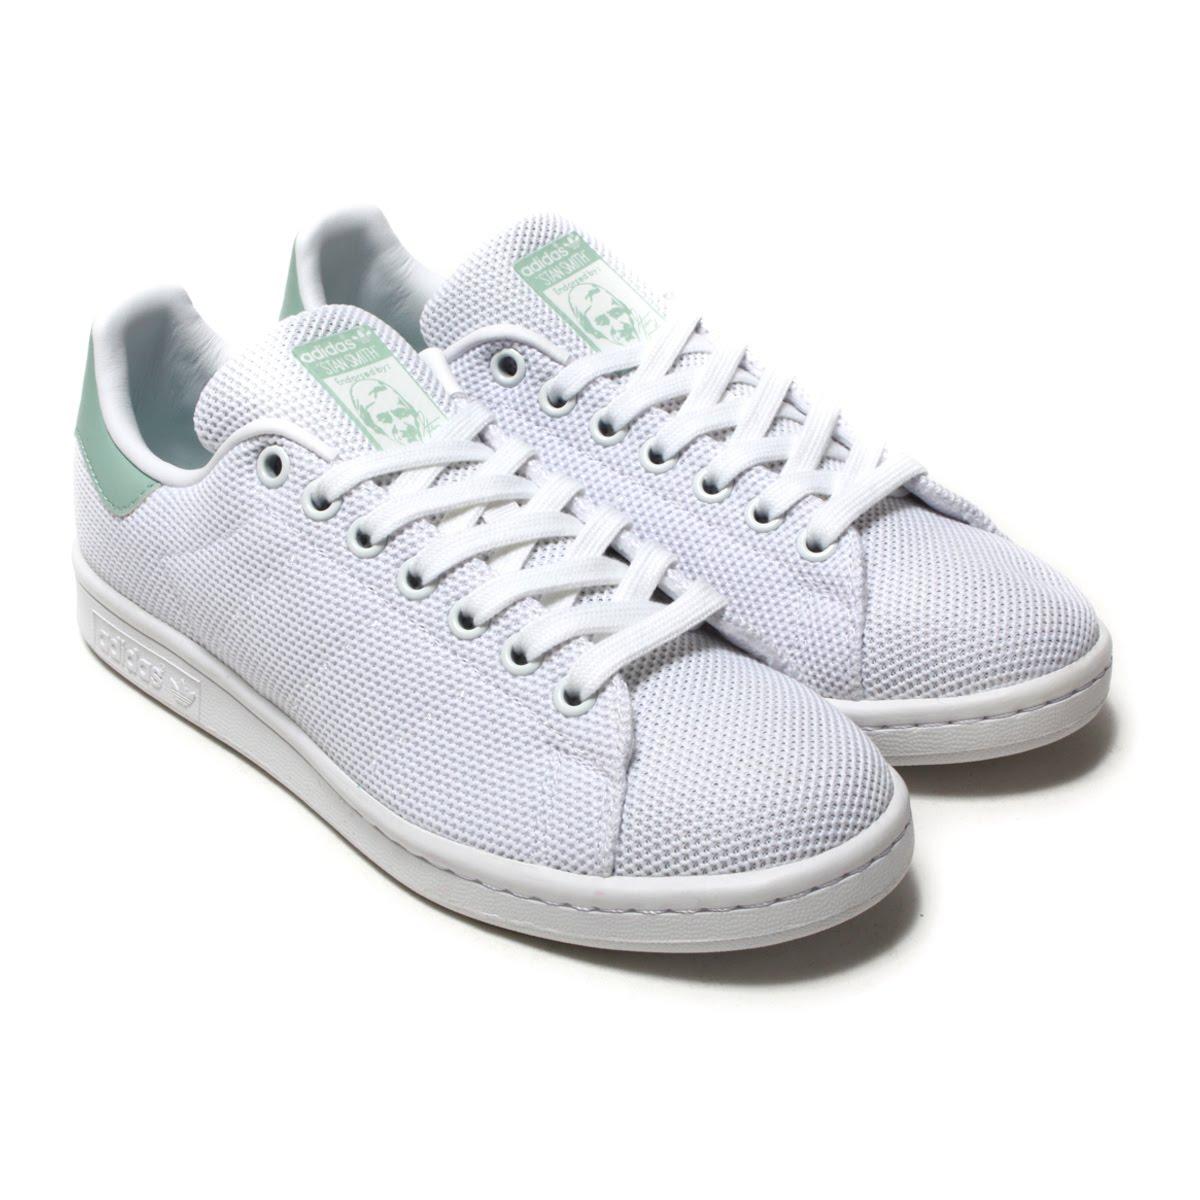 adidas Originals STAN SMITH W(アディダス オリジナルス スタンスミス W)Running White/Running White/Ash Green18SS-I